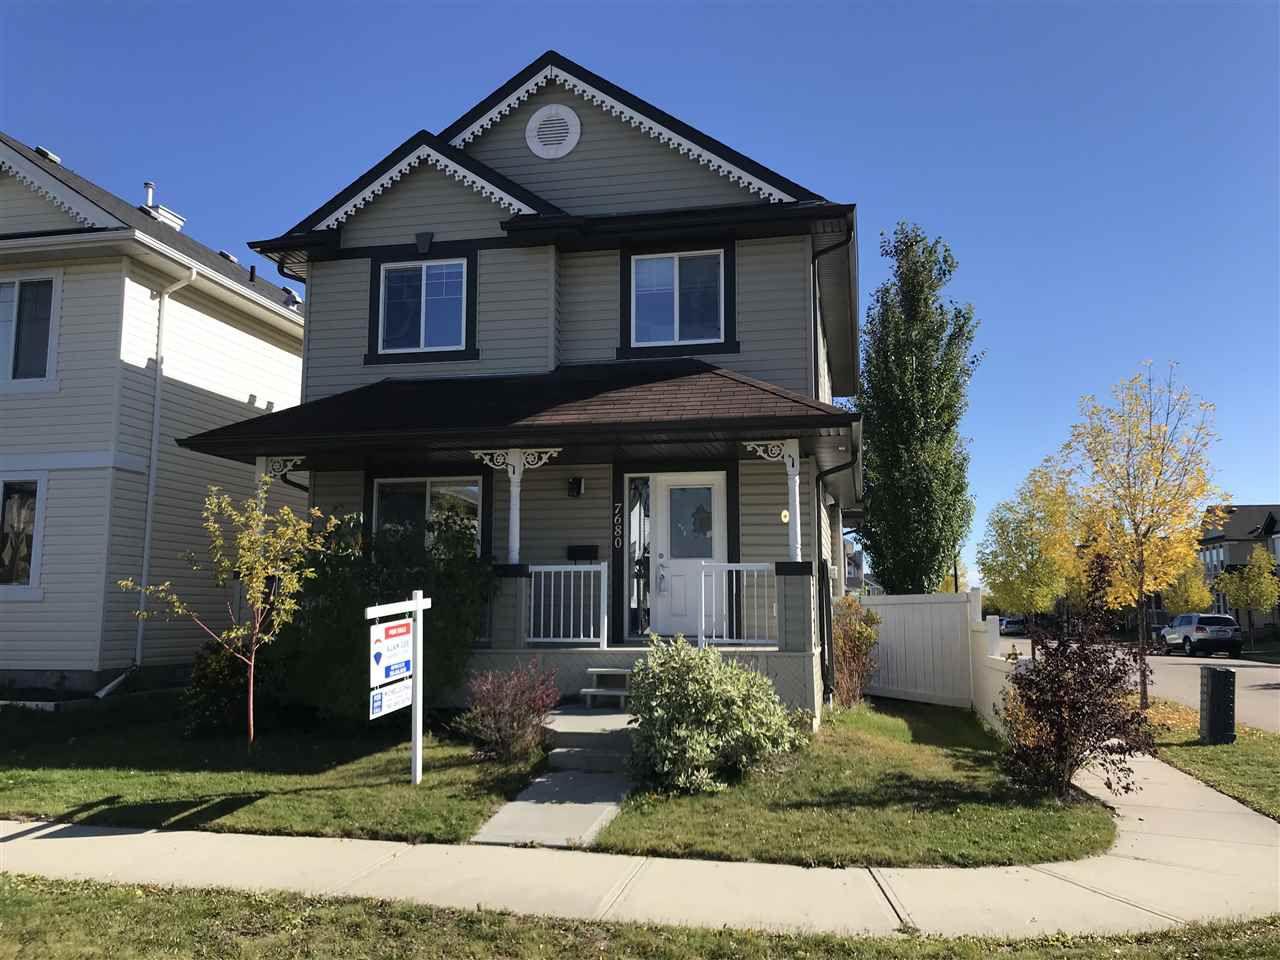 Main Photo: 7680 SCHMID Crescent in Edmonton: Zone 14 House for sale : MLS®# E4150016